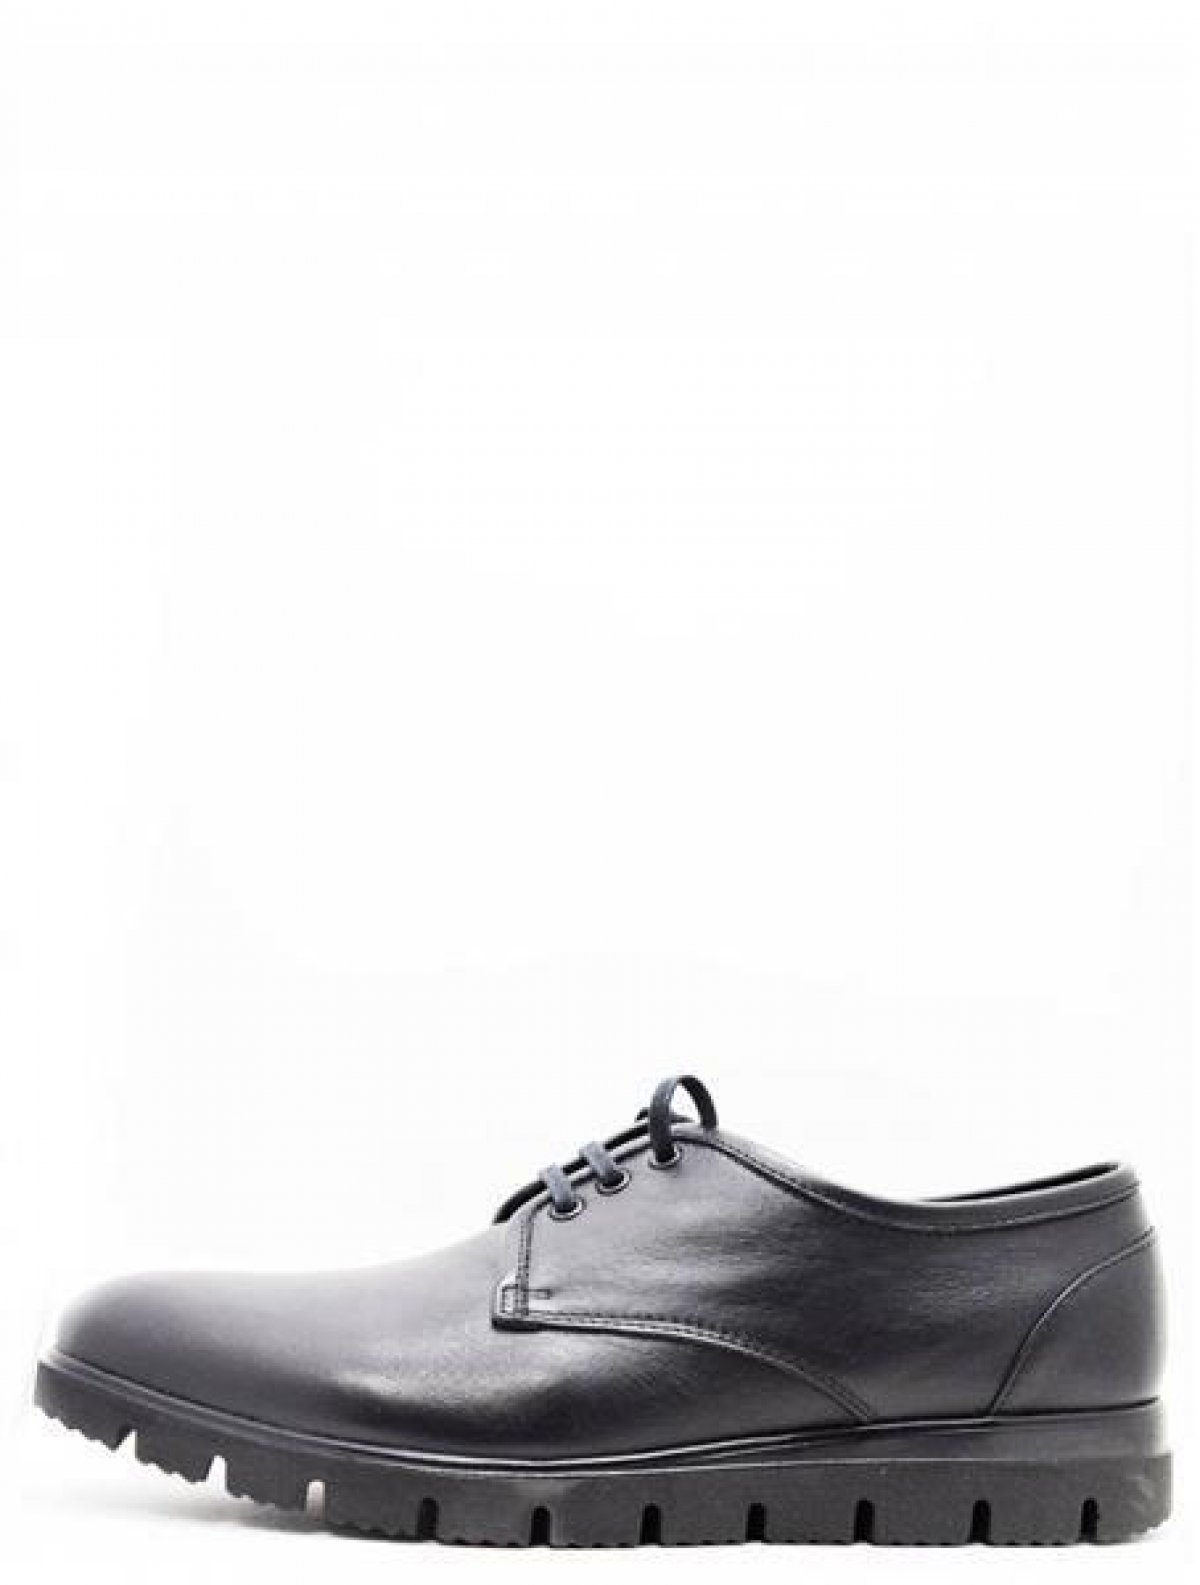 31RS_626 туфли мужские